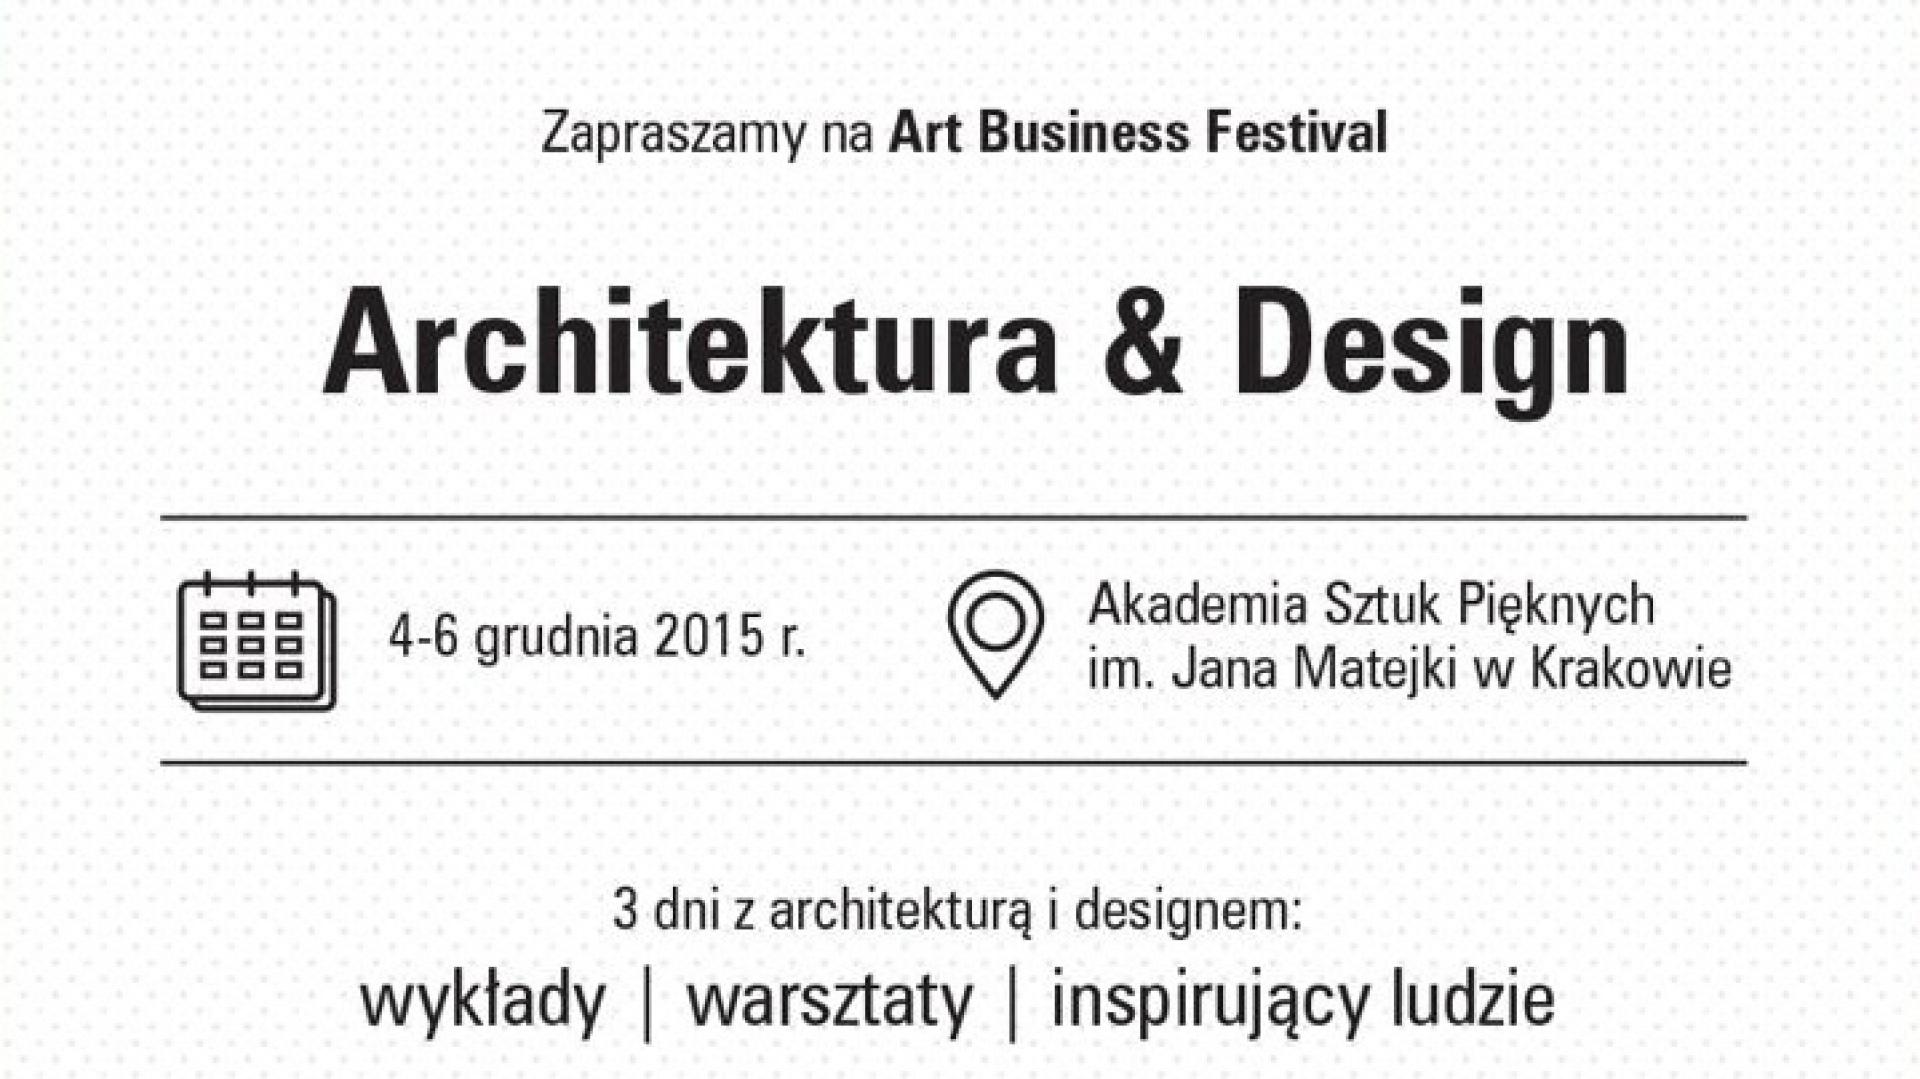 Art Business Festival. Fot. Plakat prasowy